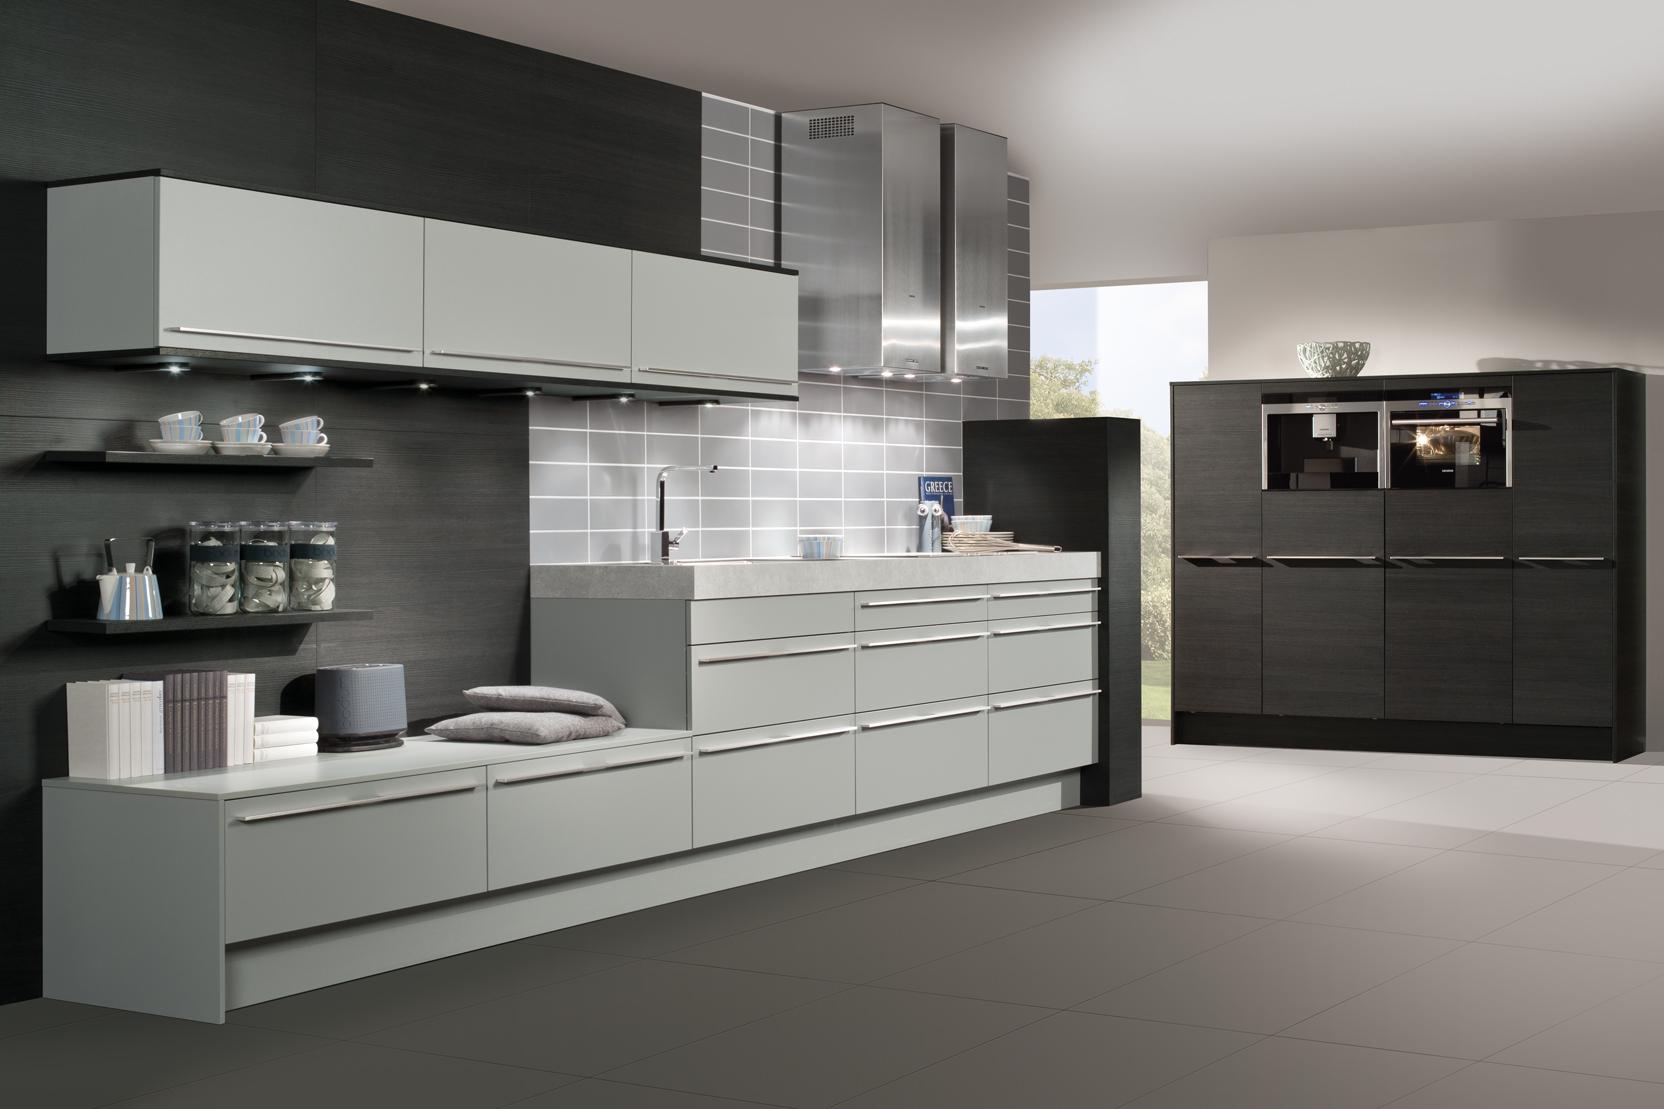 wallpaper on laminate cabinets laminate kitchen cabinets laminate base and wall cabinets and black